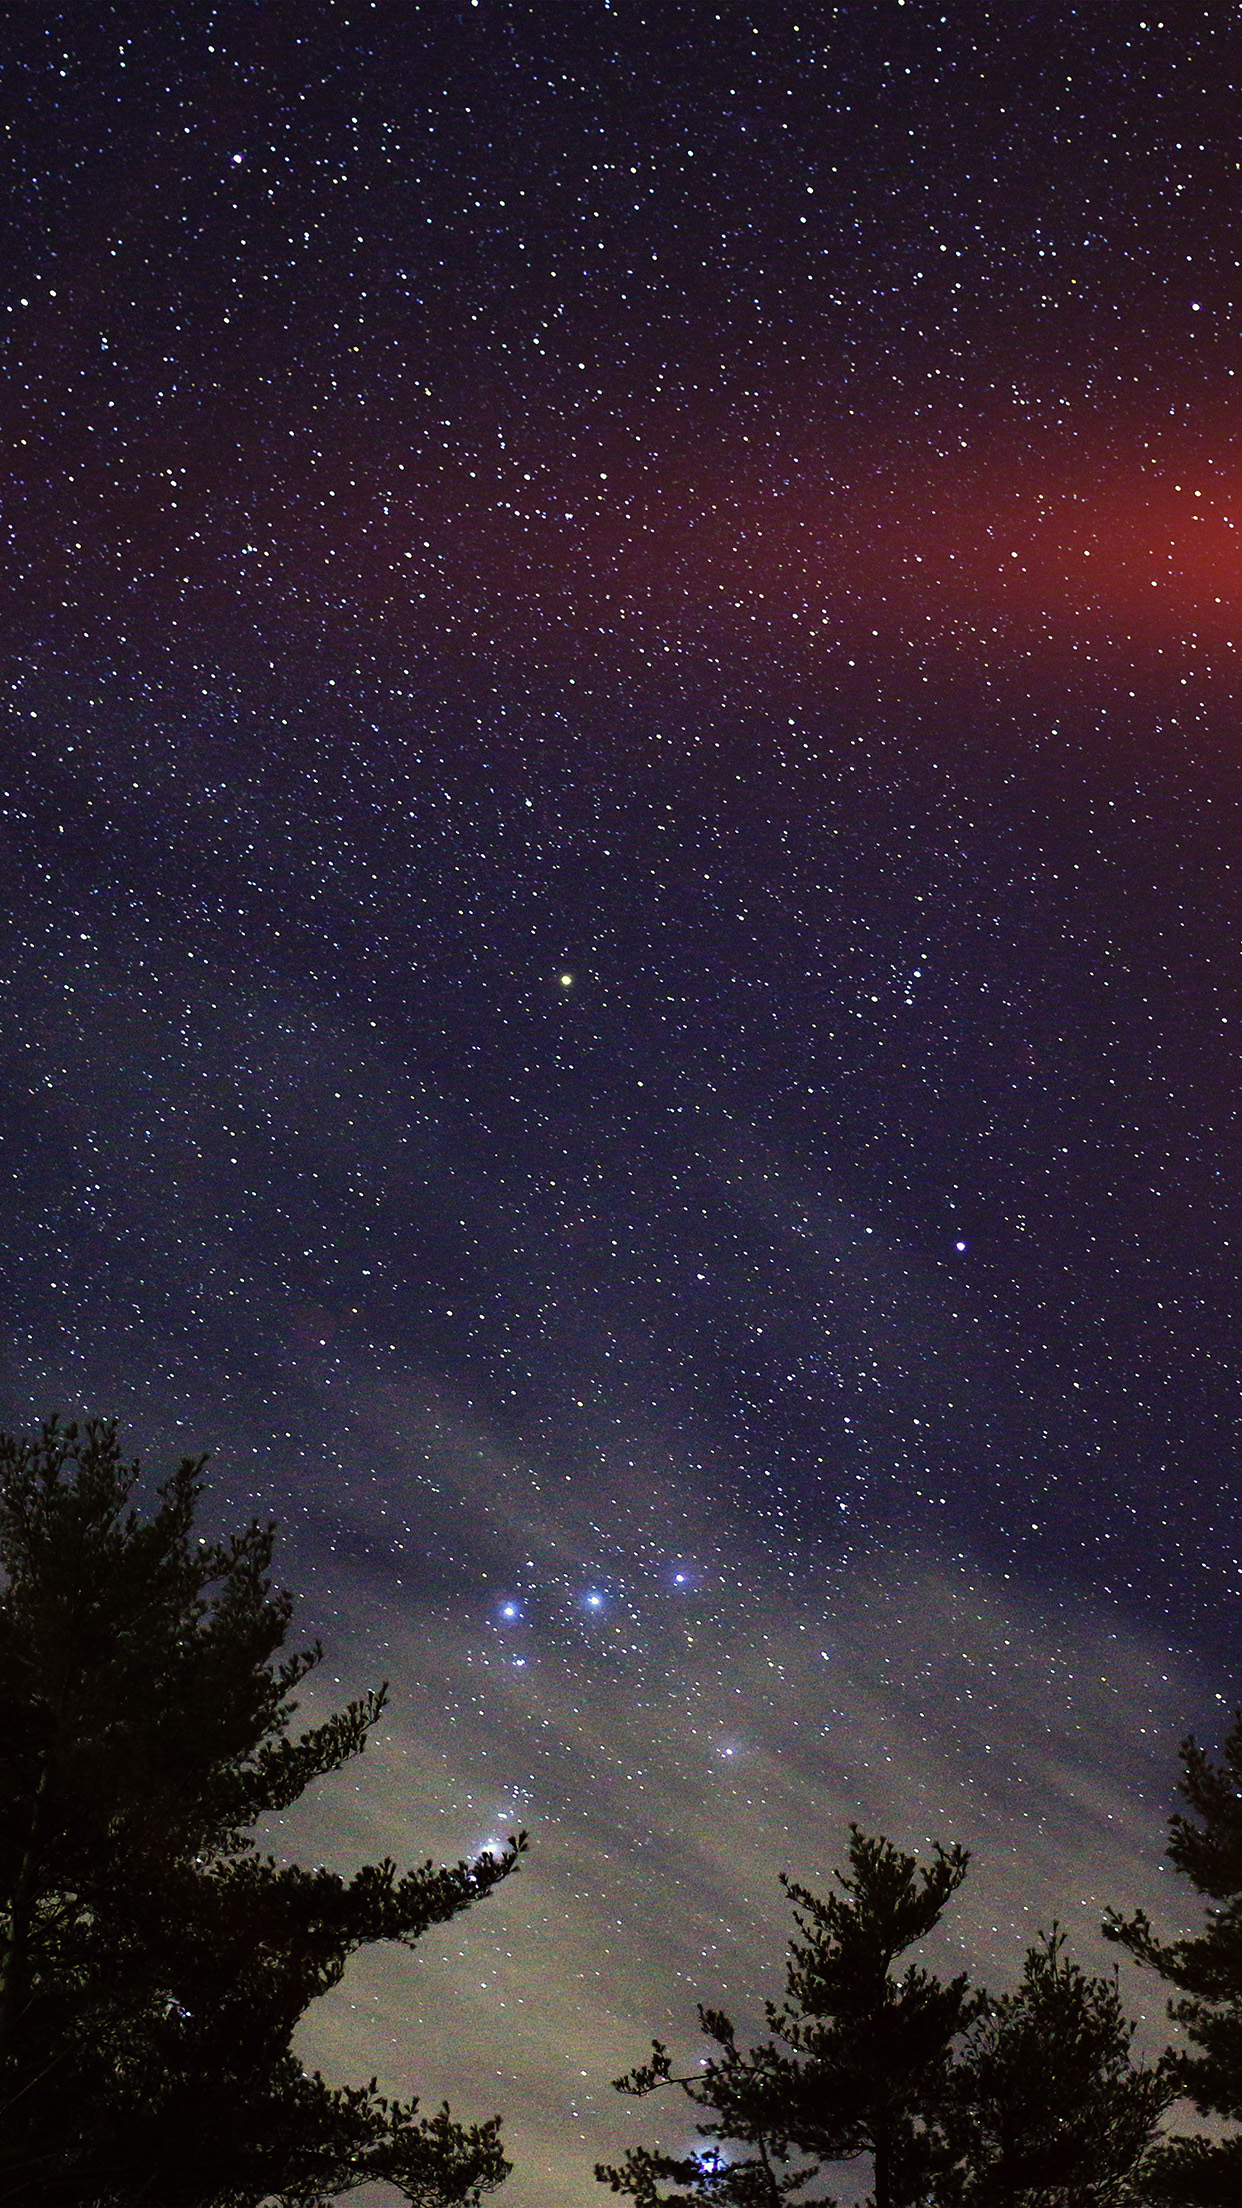 Dark Wood Iphone Wallpaper Ni86 Night Sky Star Wood Space Starry Blue Dark Flare